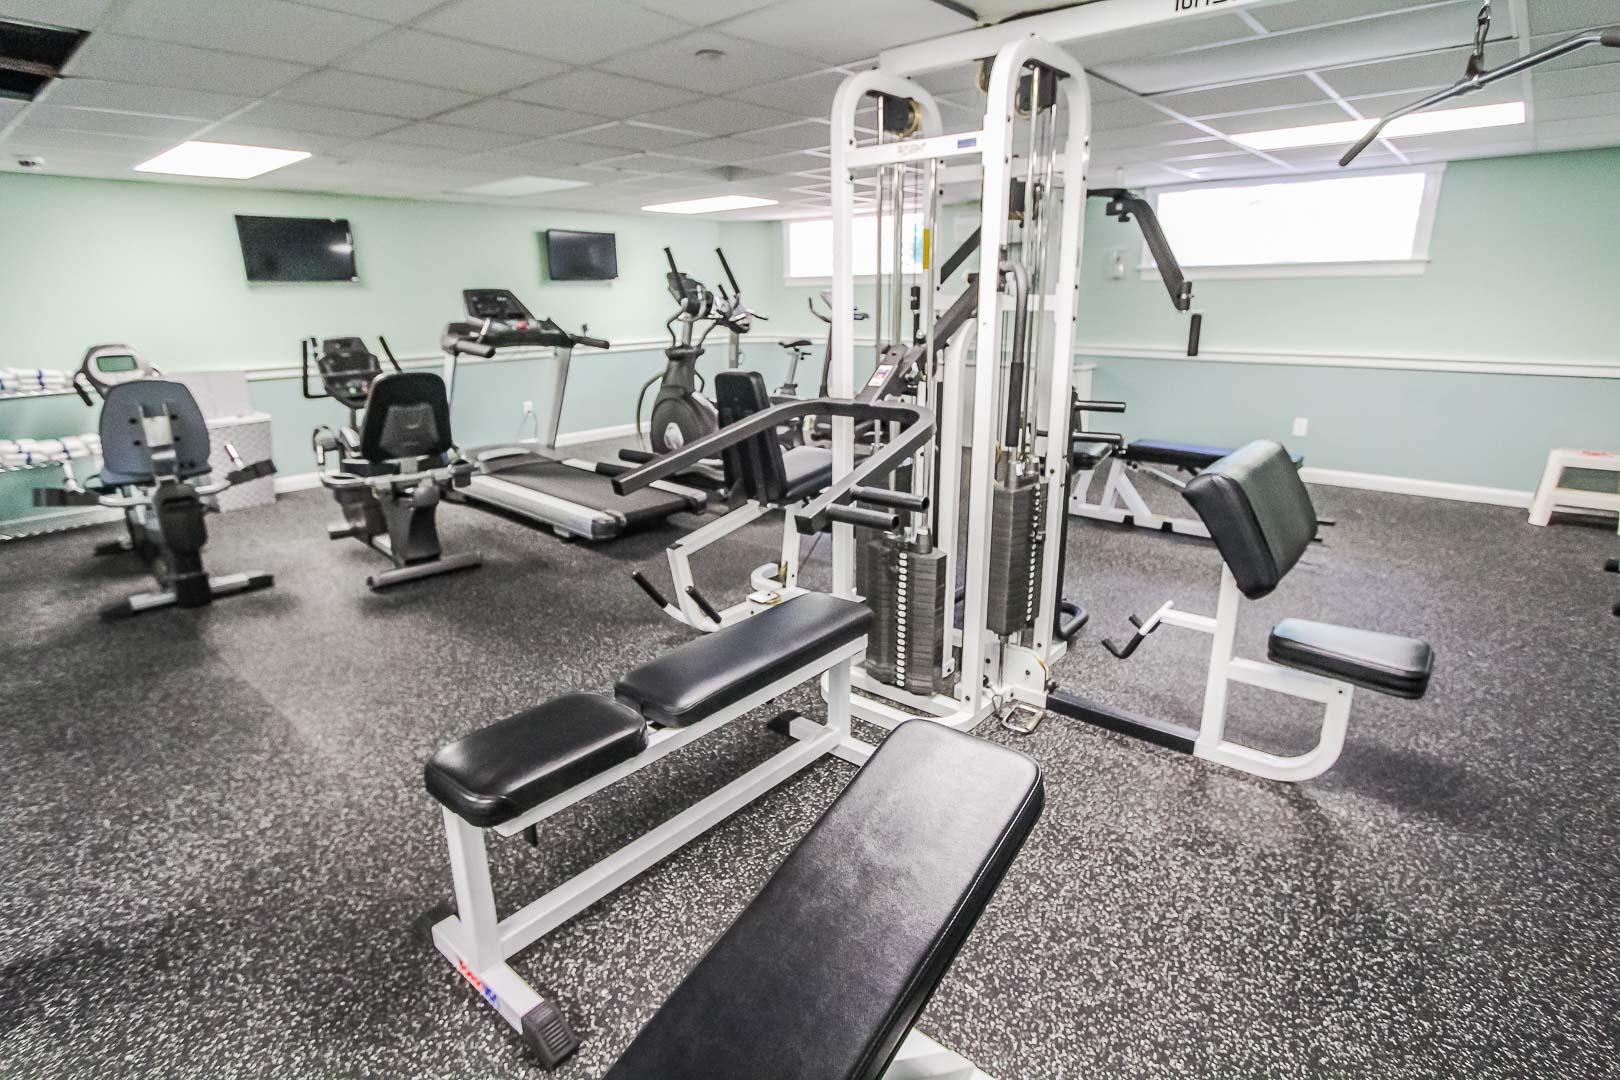 An expansive fitness center at VRI's Holly Tree Resort in Massachusetts.